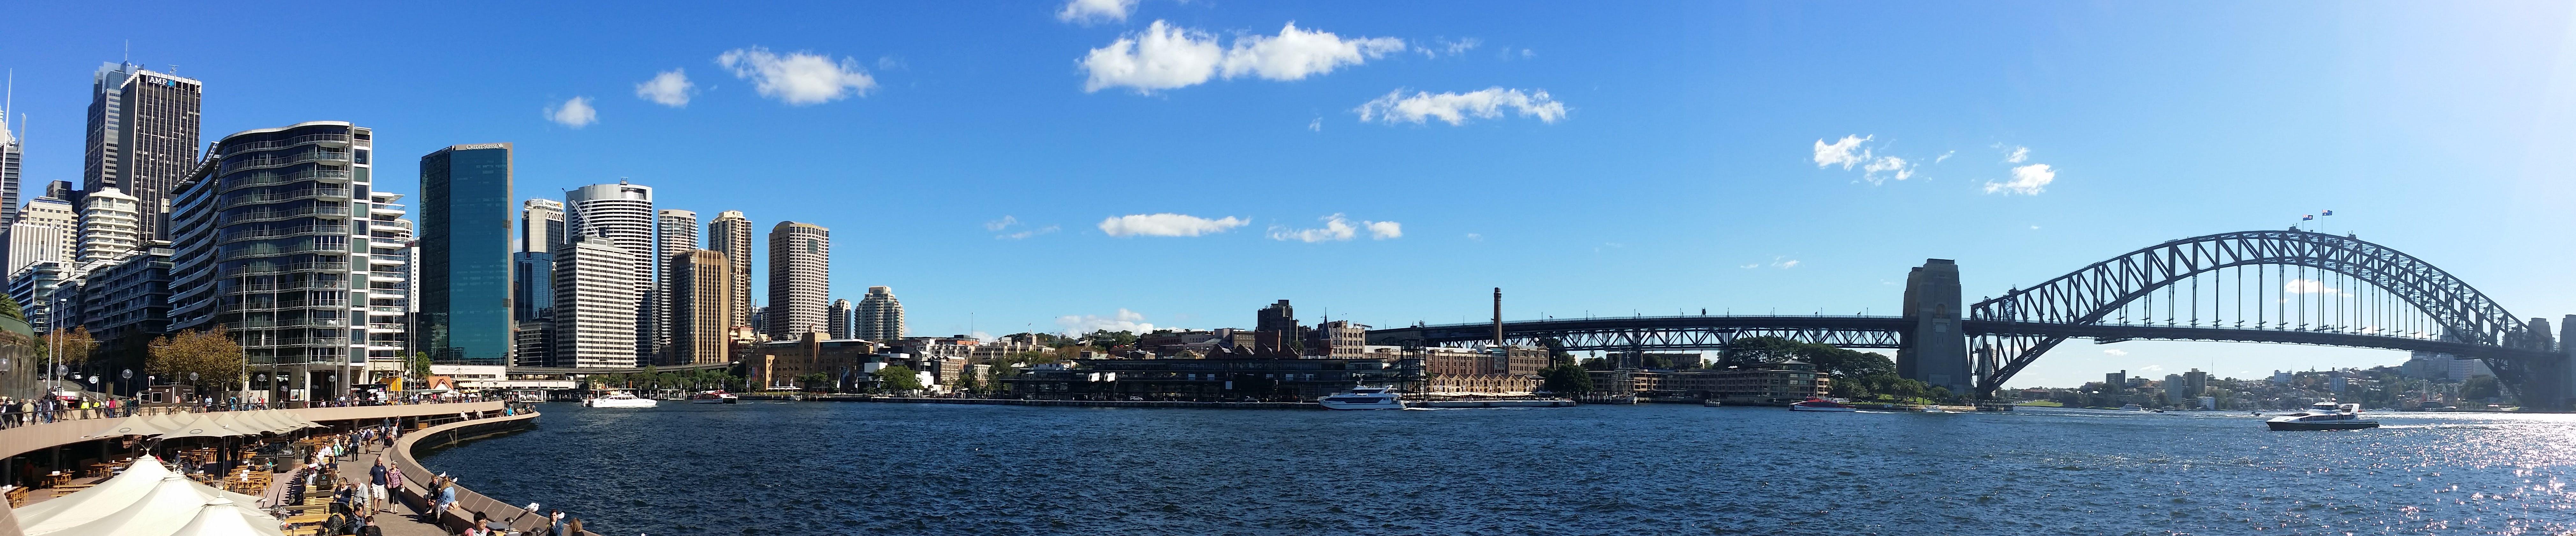 Free stock photo of blue sky, blue water, bridge, harbour